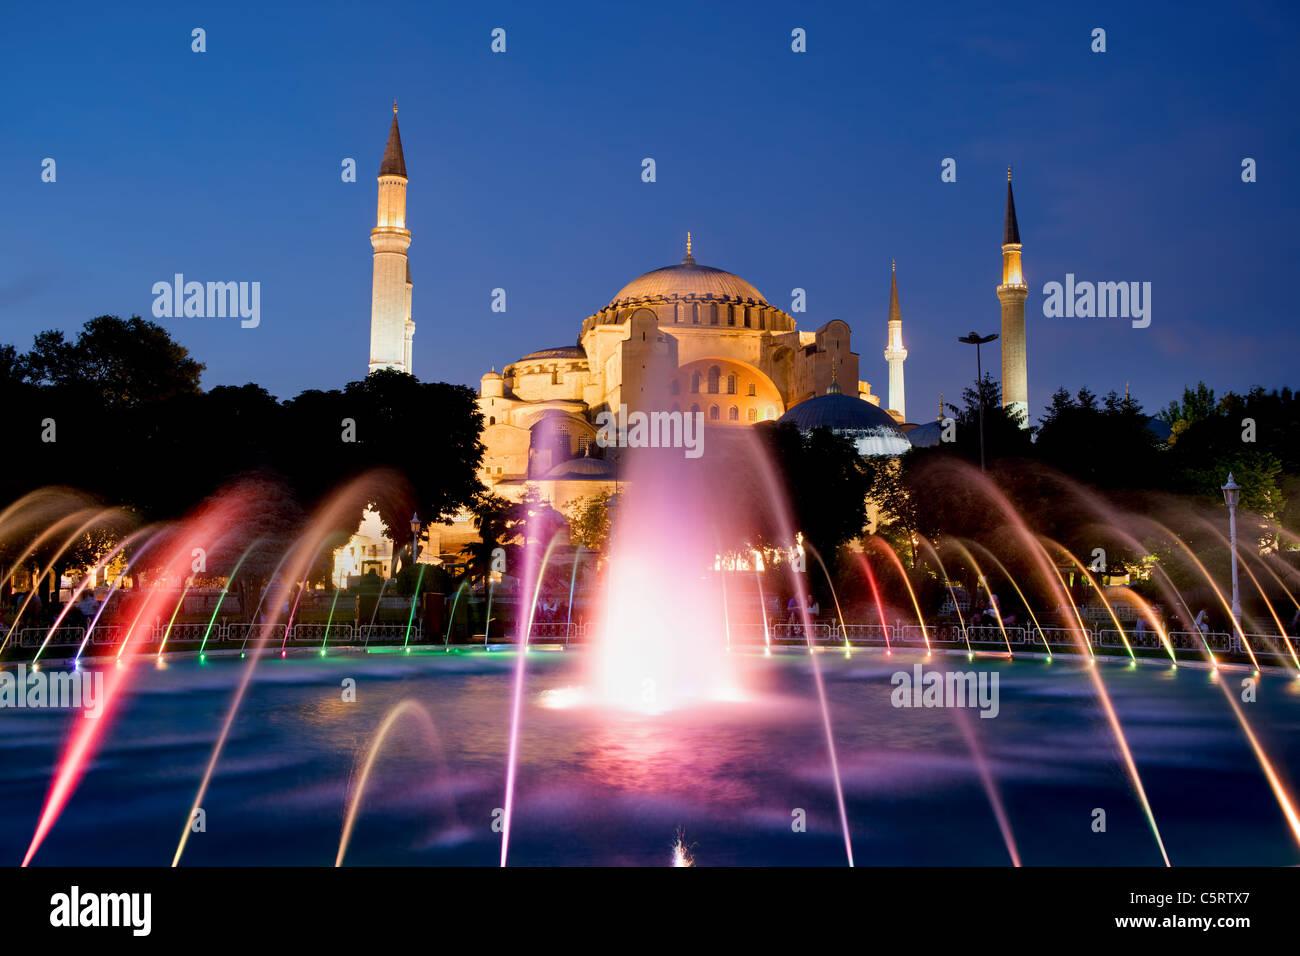 The Hagia Sophia Byzantine architecture and fountain illuminated at dusk, famous historic landmark in Istanbul, Stock Photo